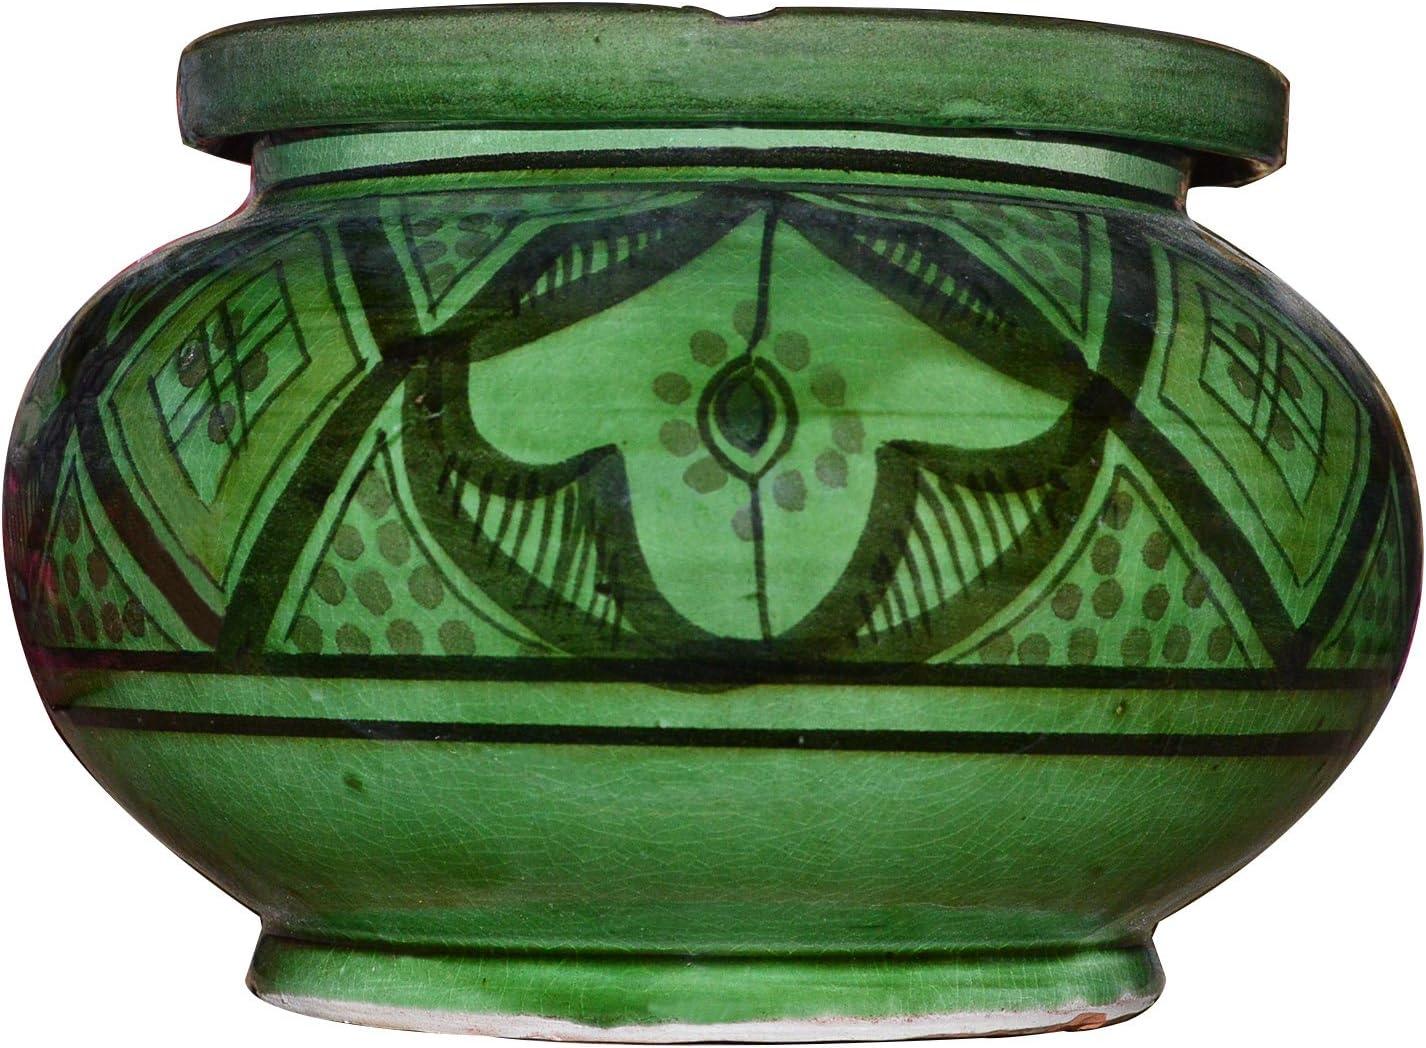 Ceramic Ashtrays Smokeless Exquisite Extra Raleigh Mall 2021 model Glazes Large